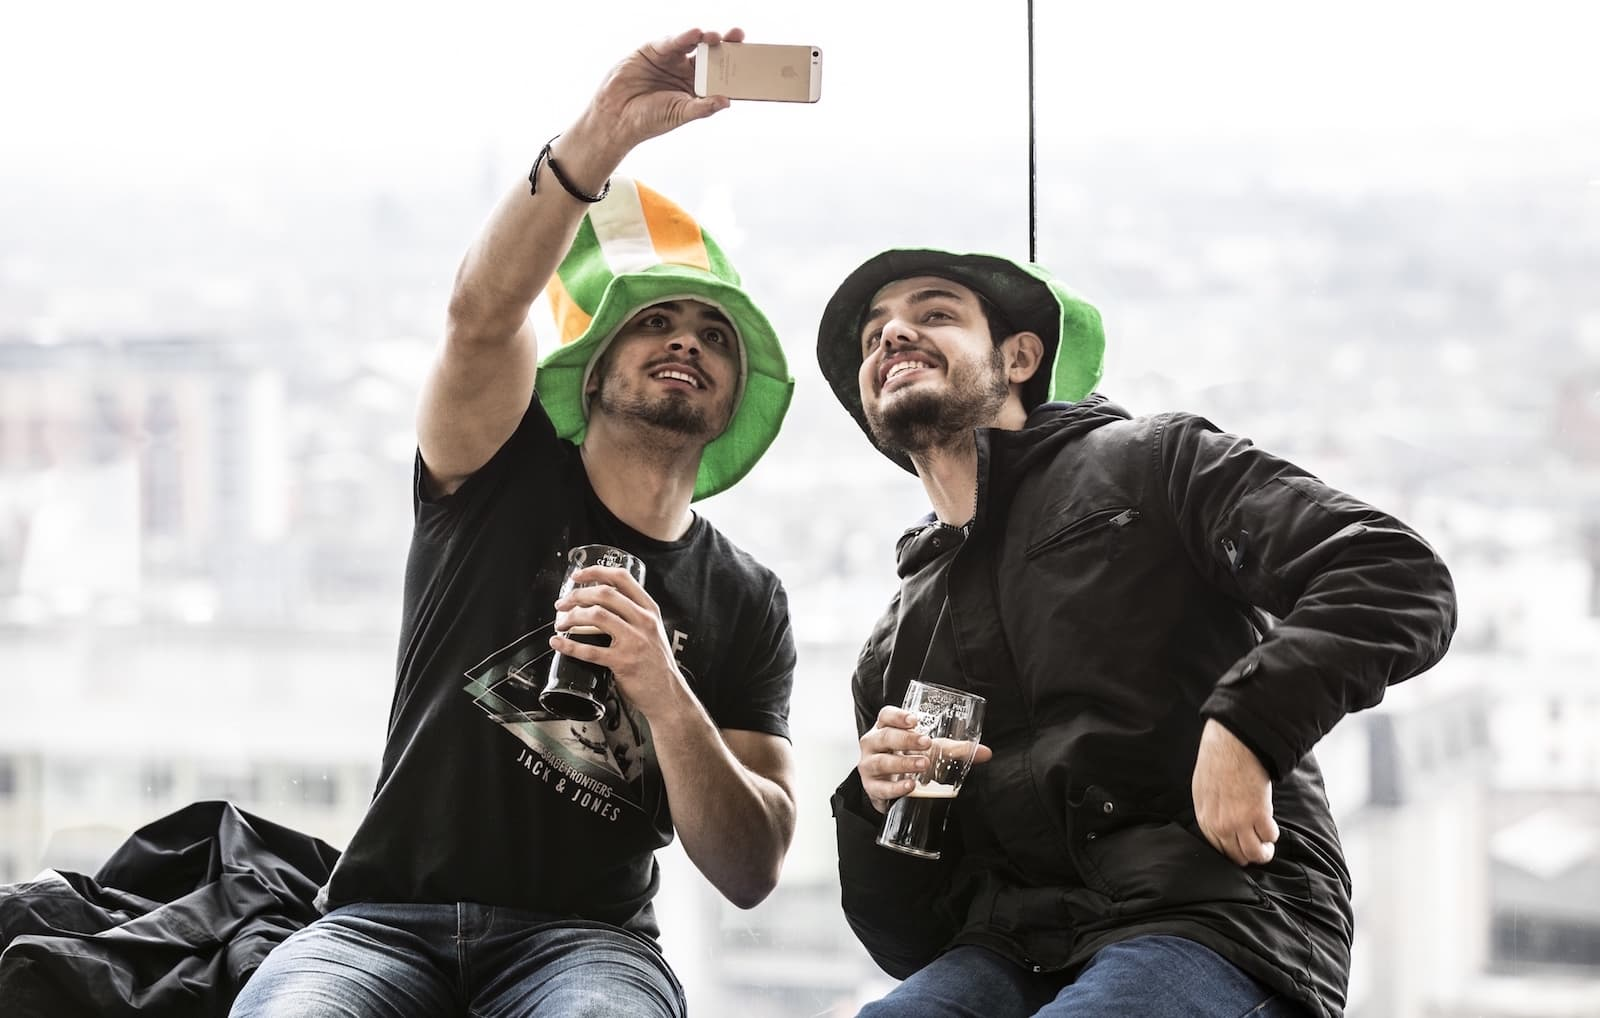 St Patrick's Day firas med parad i Stockholm